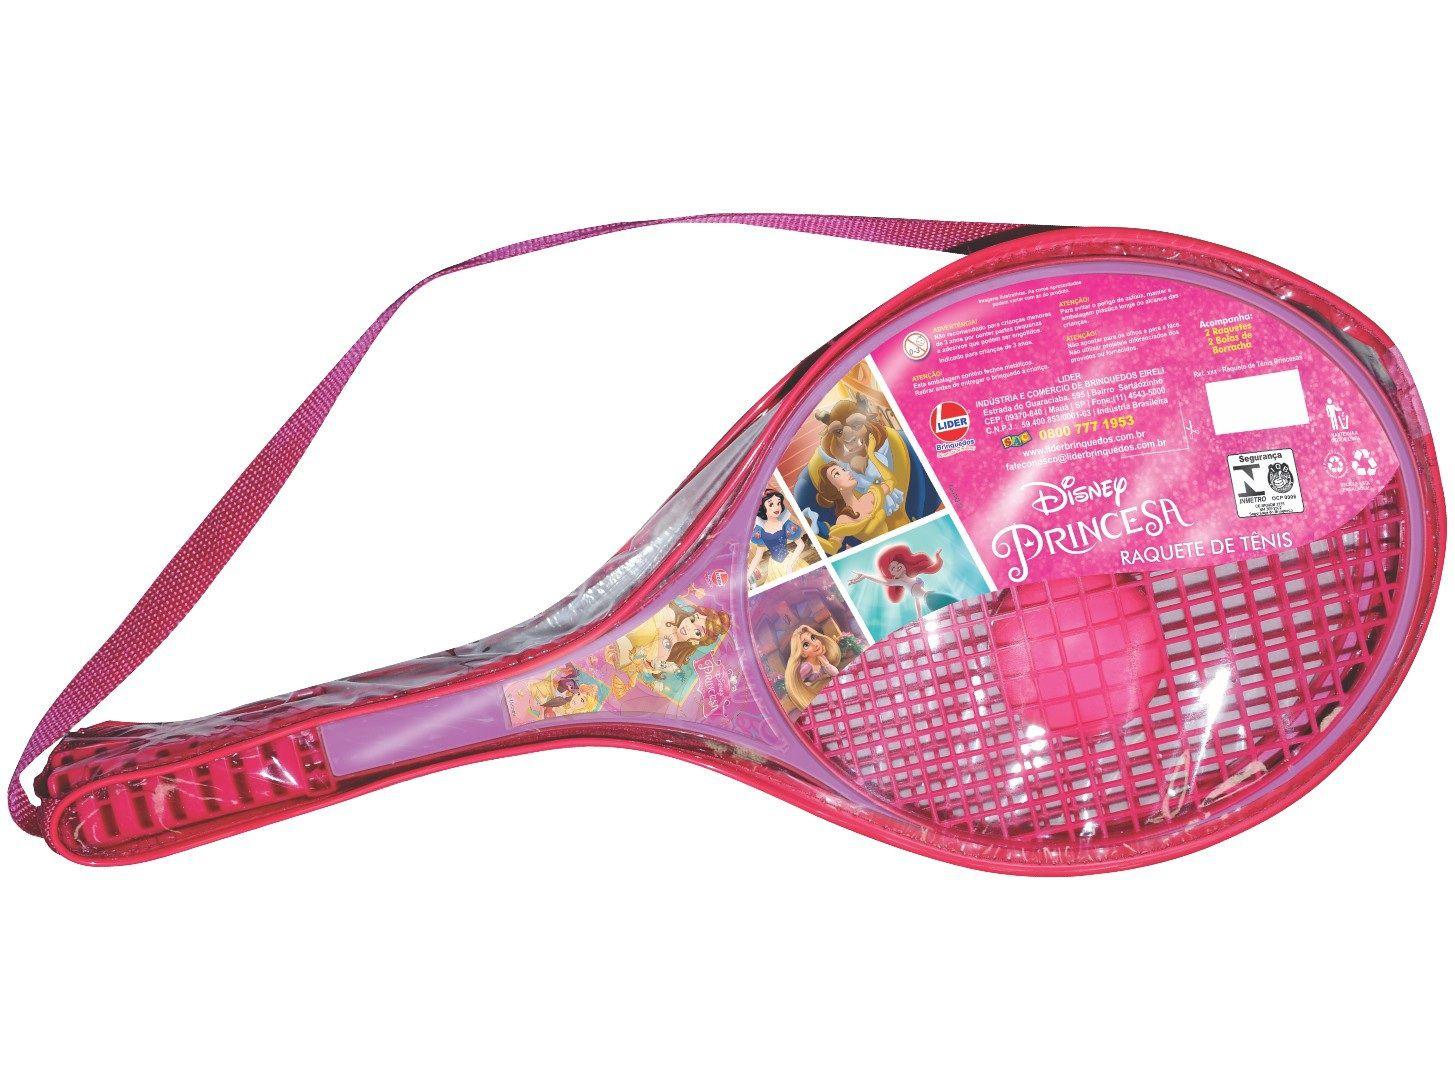 Raquete de Tênis Disney Princesa - Lider Brinquedos